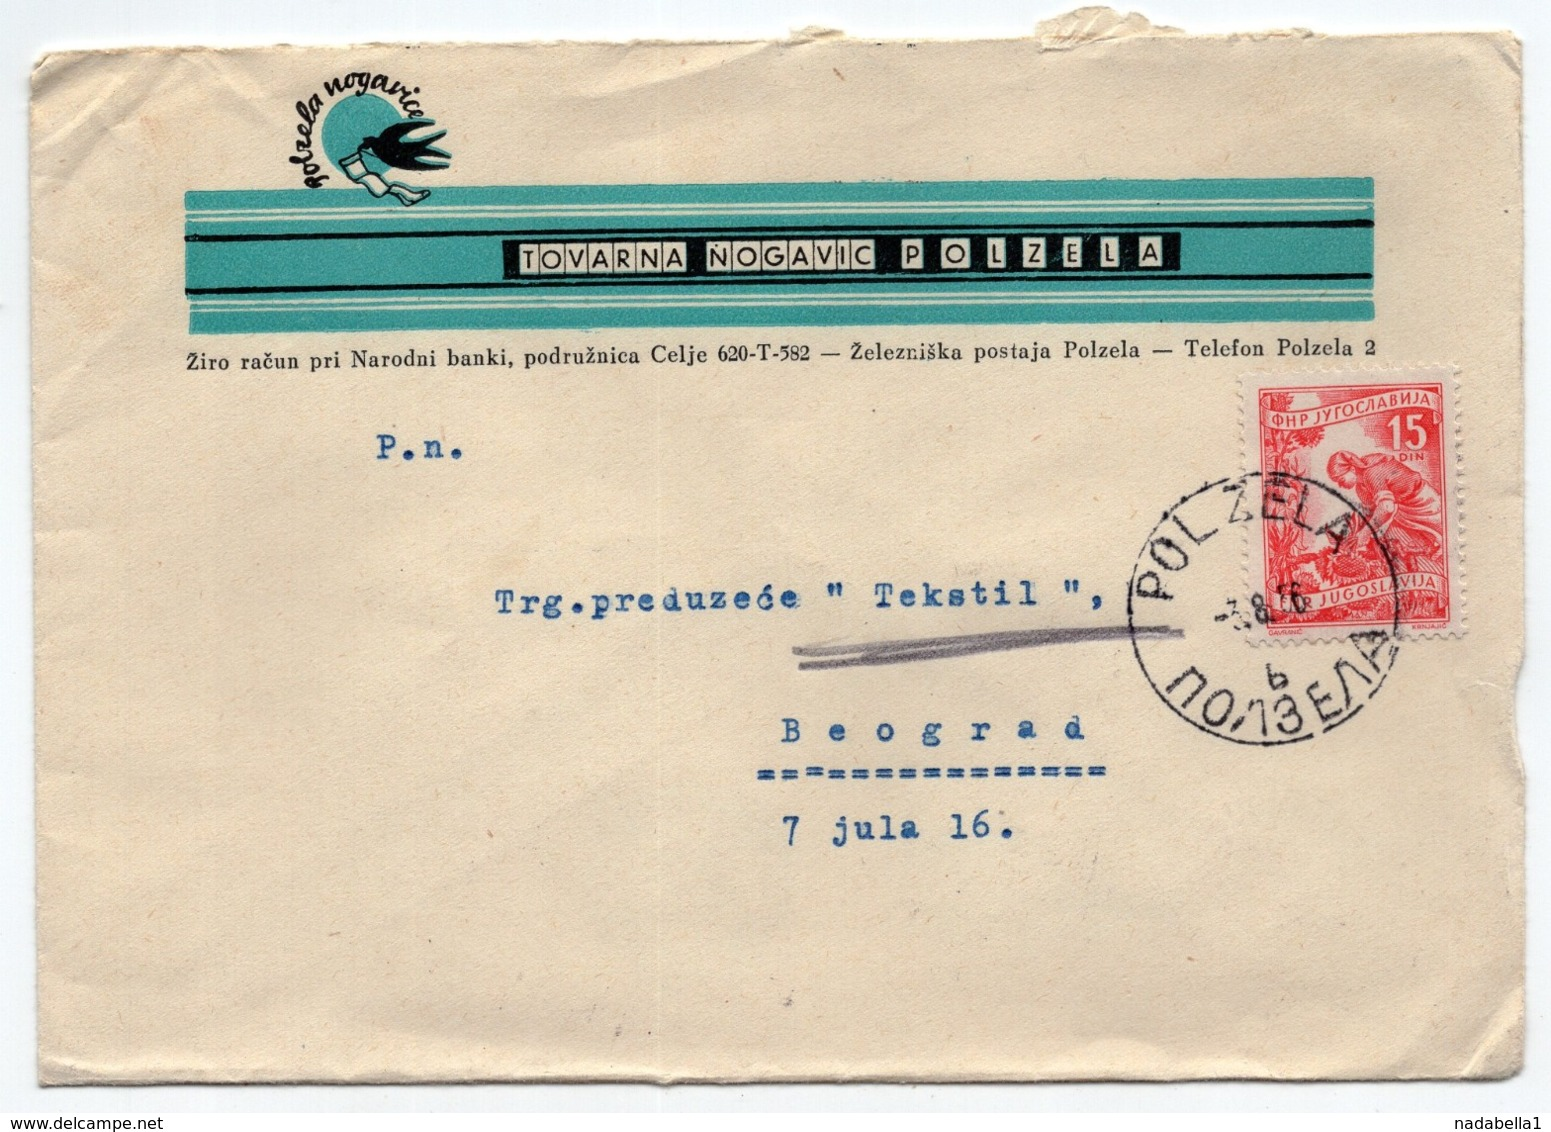 1956 YUGOSLAVIA, SLOVENIA, POLZELA TO BELGRADE, SOCKS MANUFACTURING COMPANY HEADCOVER - 1945-1992 Sozialistische Föderative Republik Jugoslawien